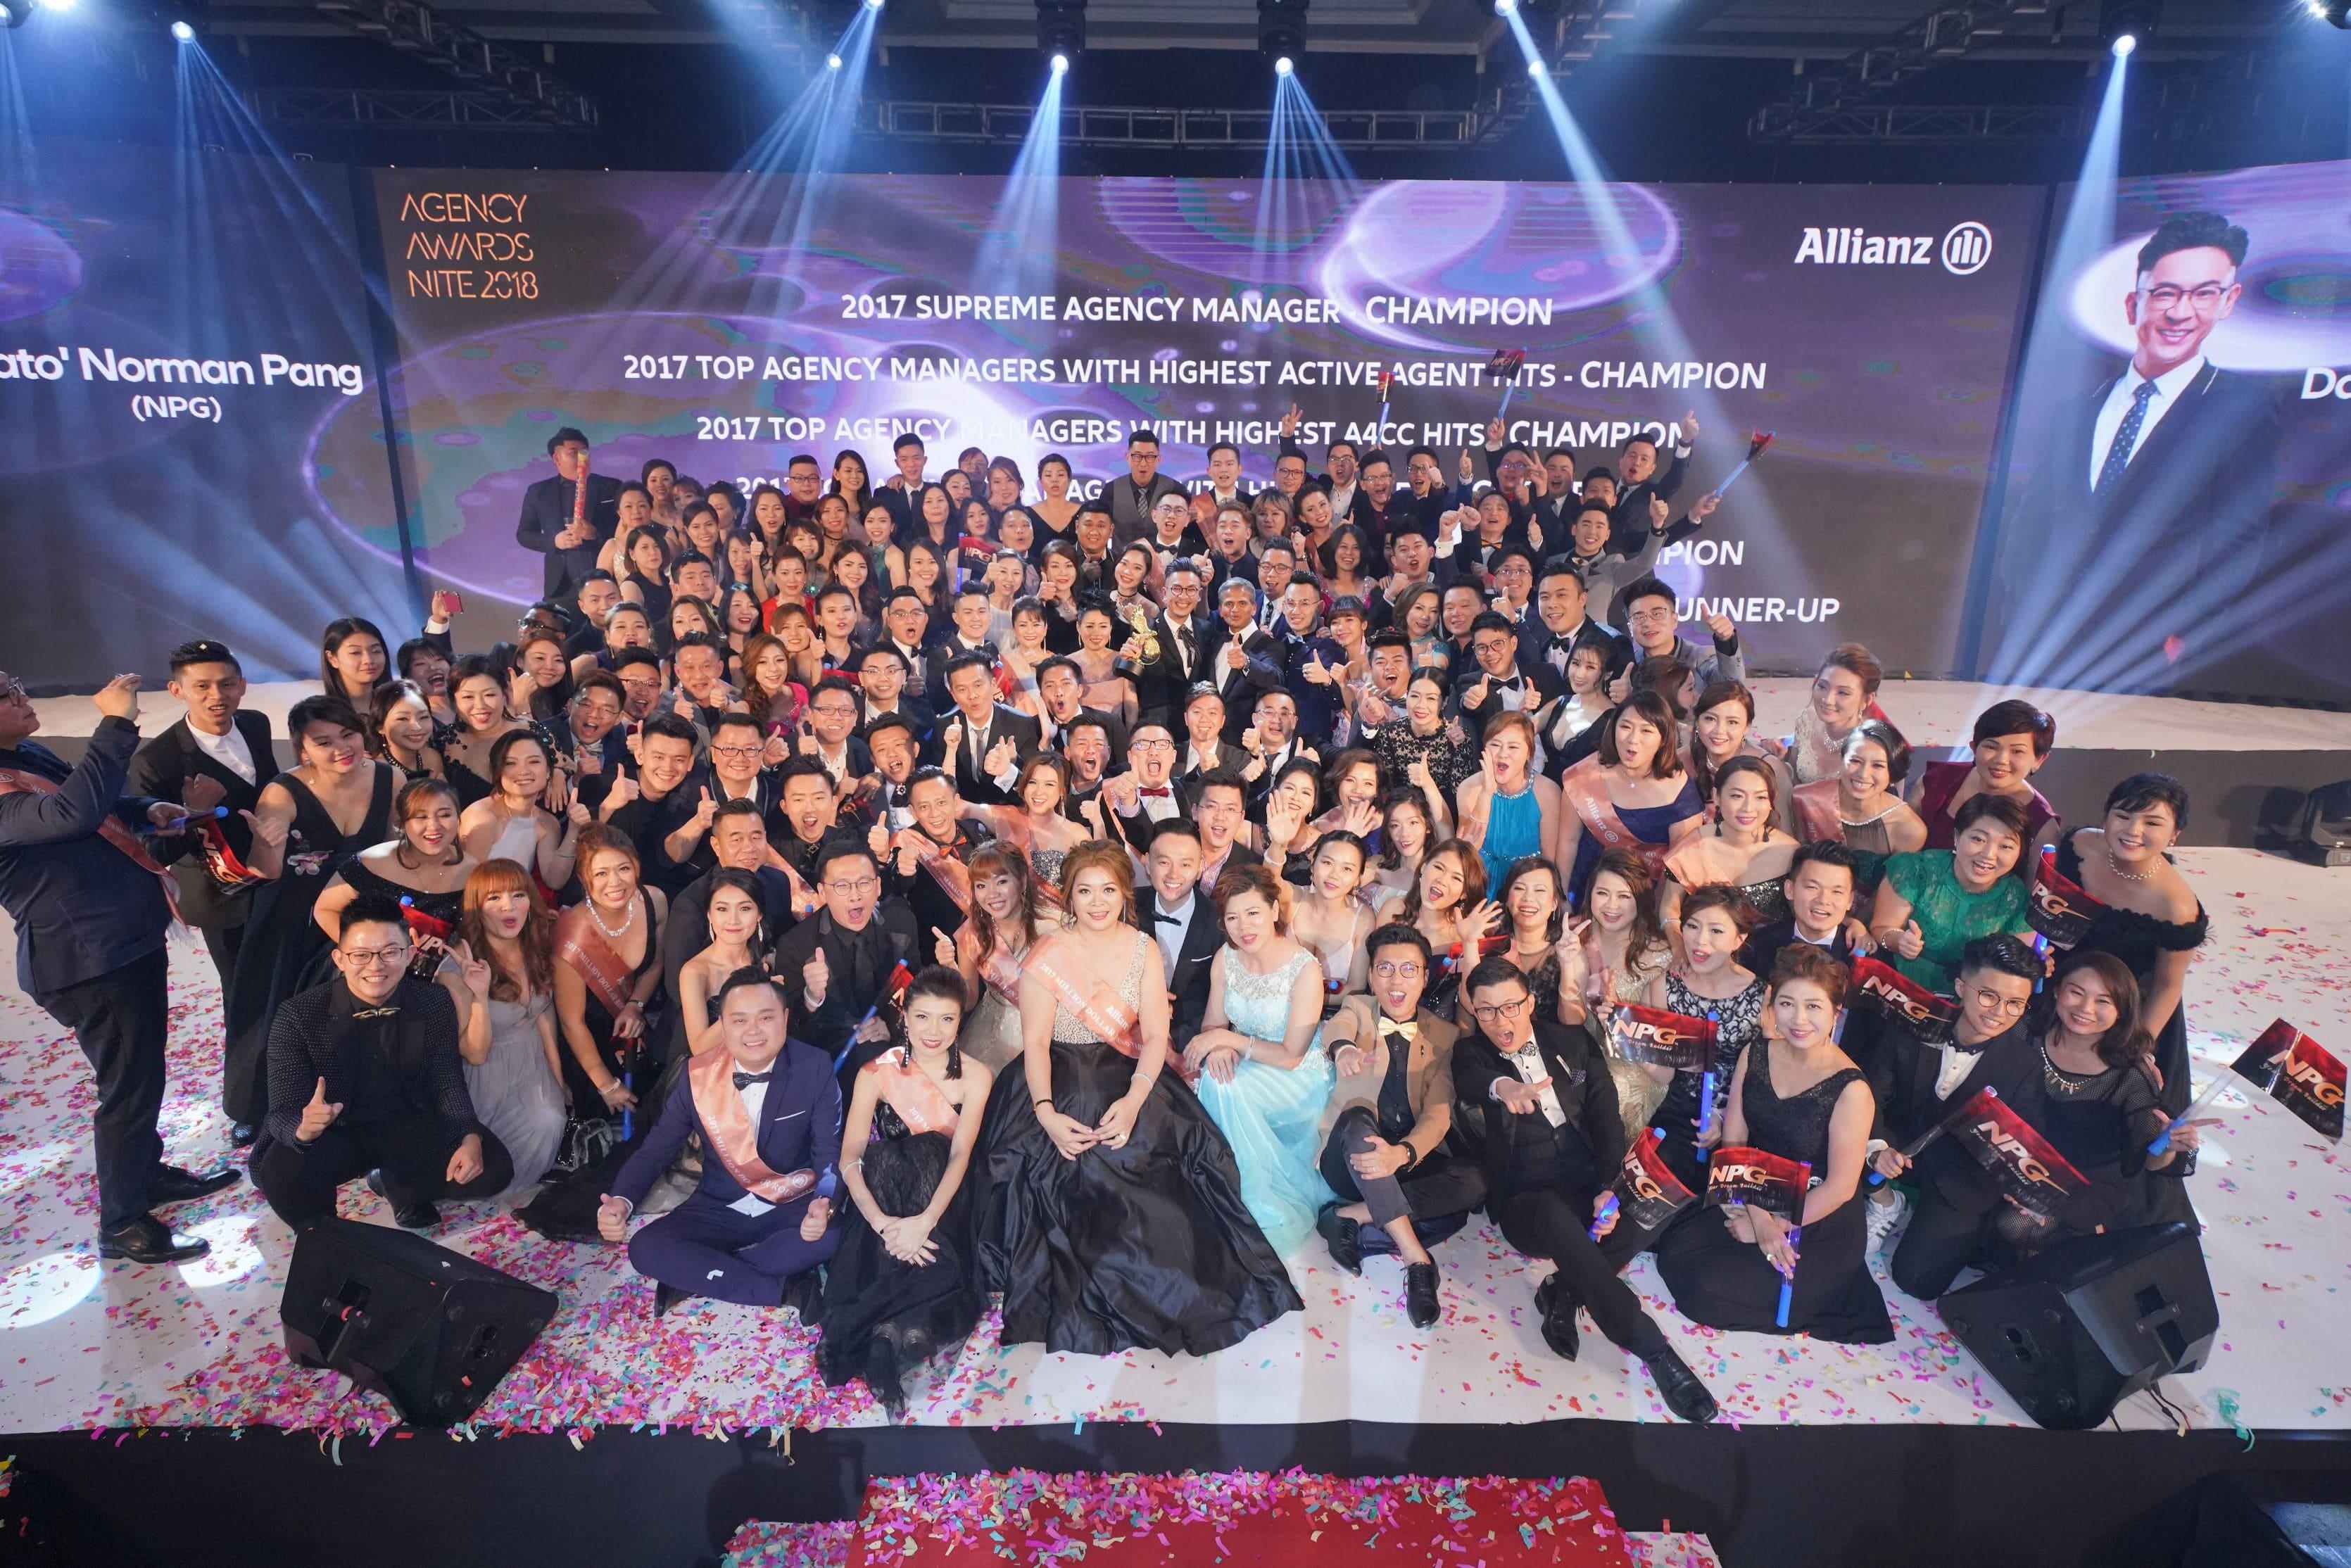 allianz agency award